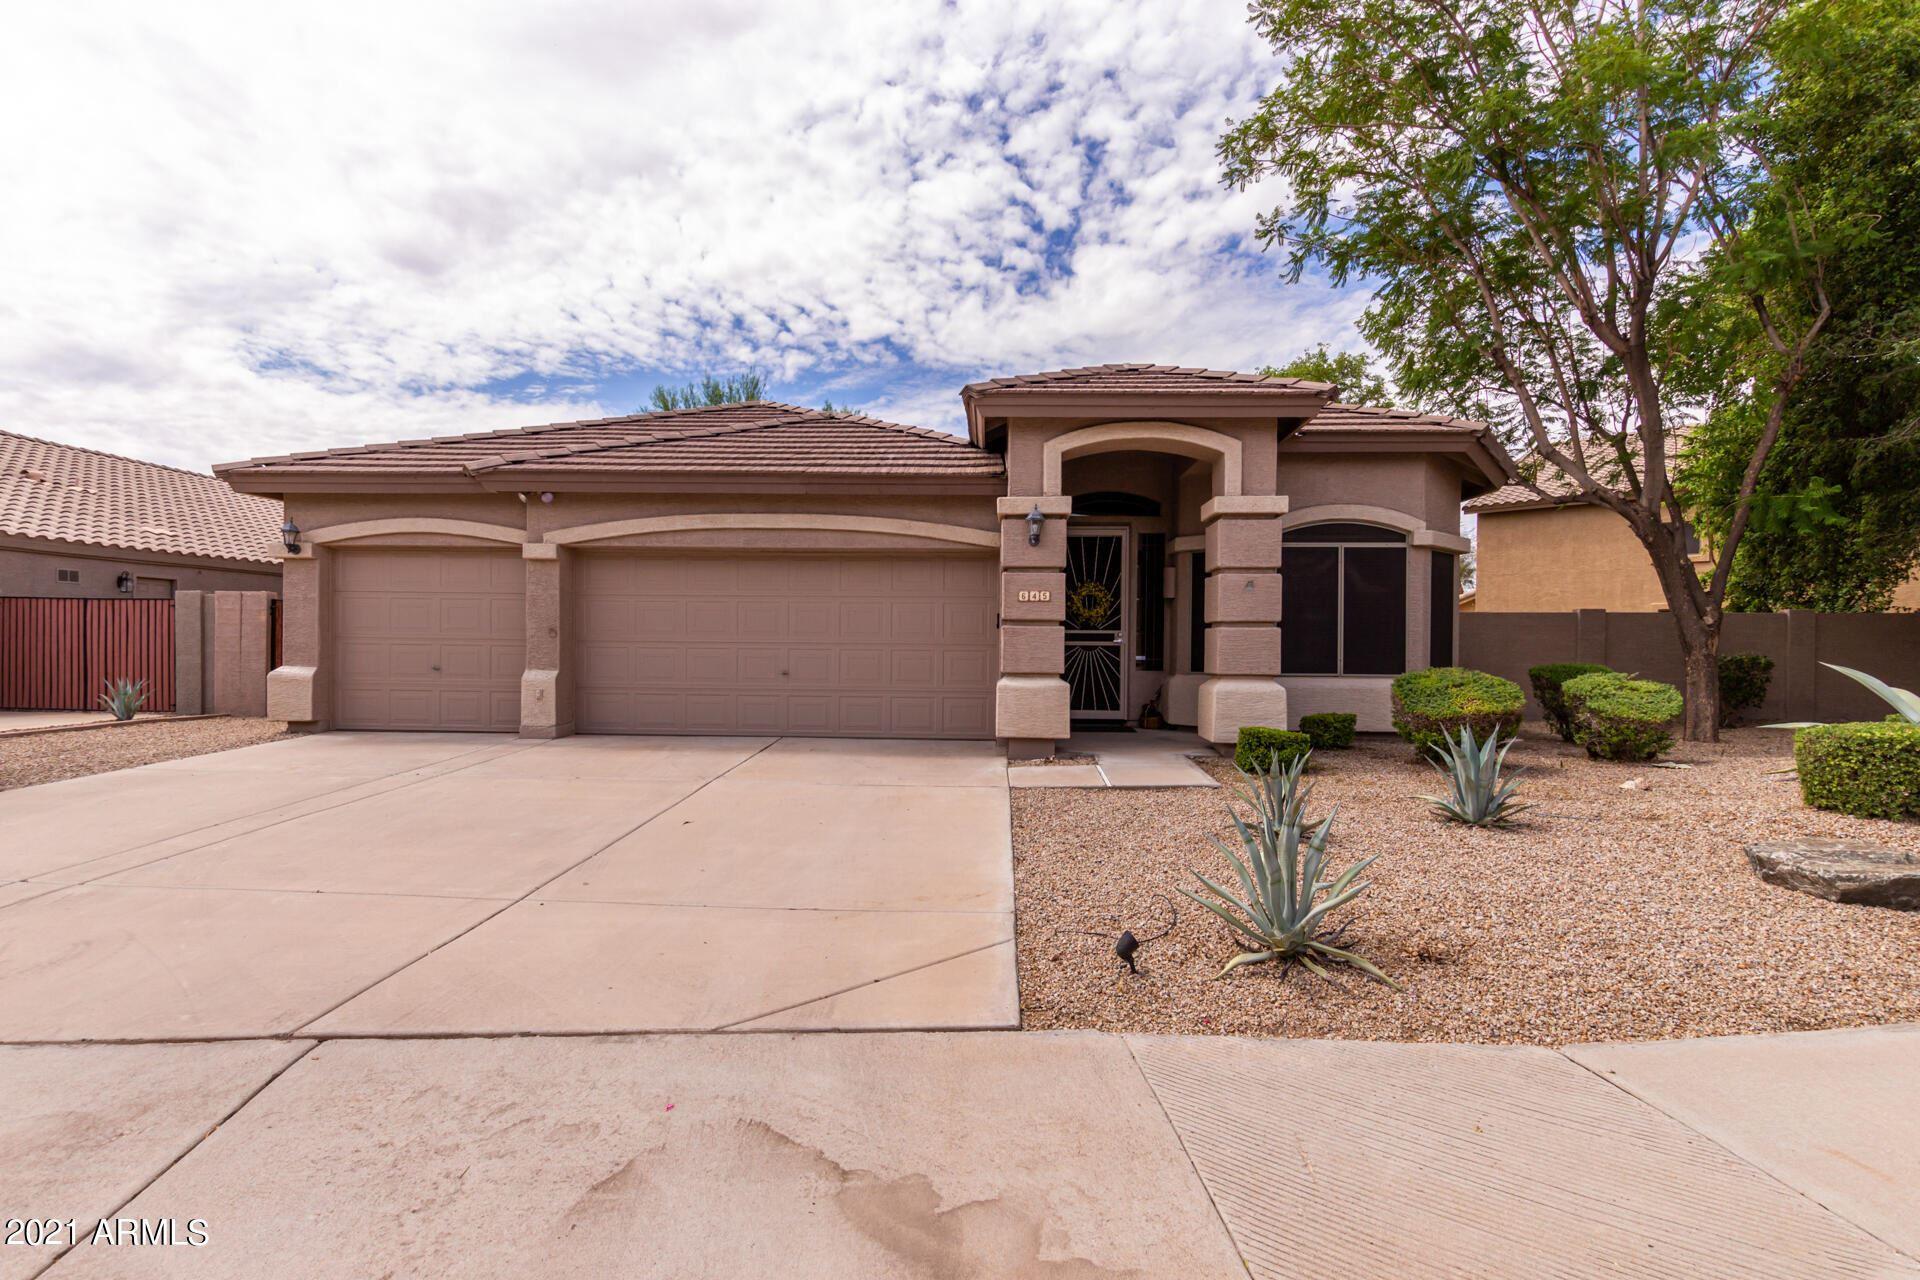 645 W MYRTLE Drive, Chandler, AZ 85248 - MLS#: 6268584